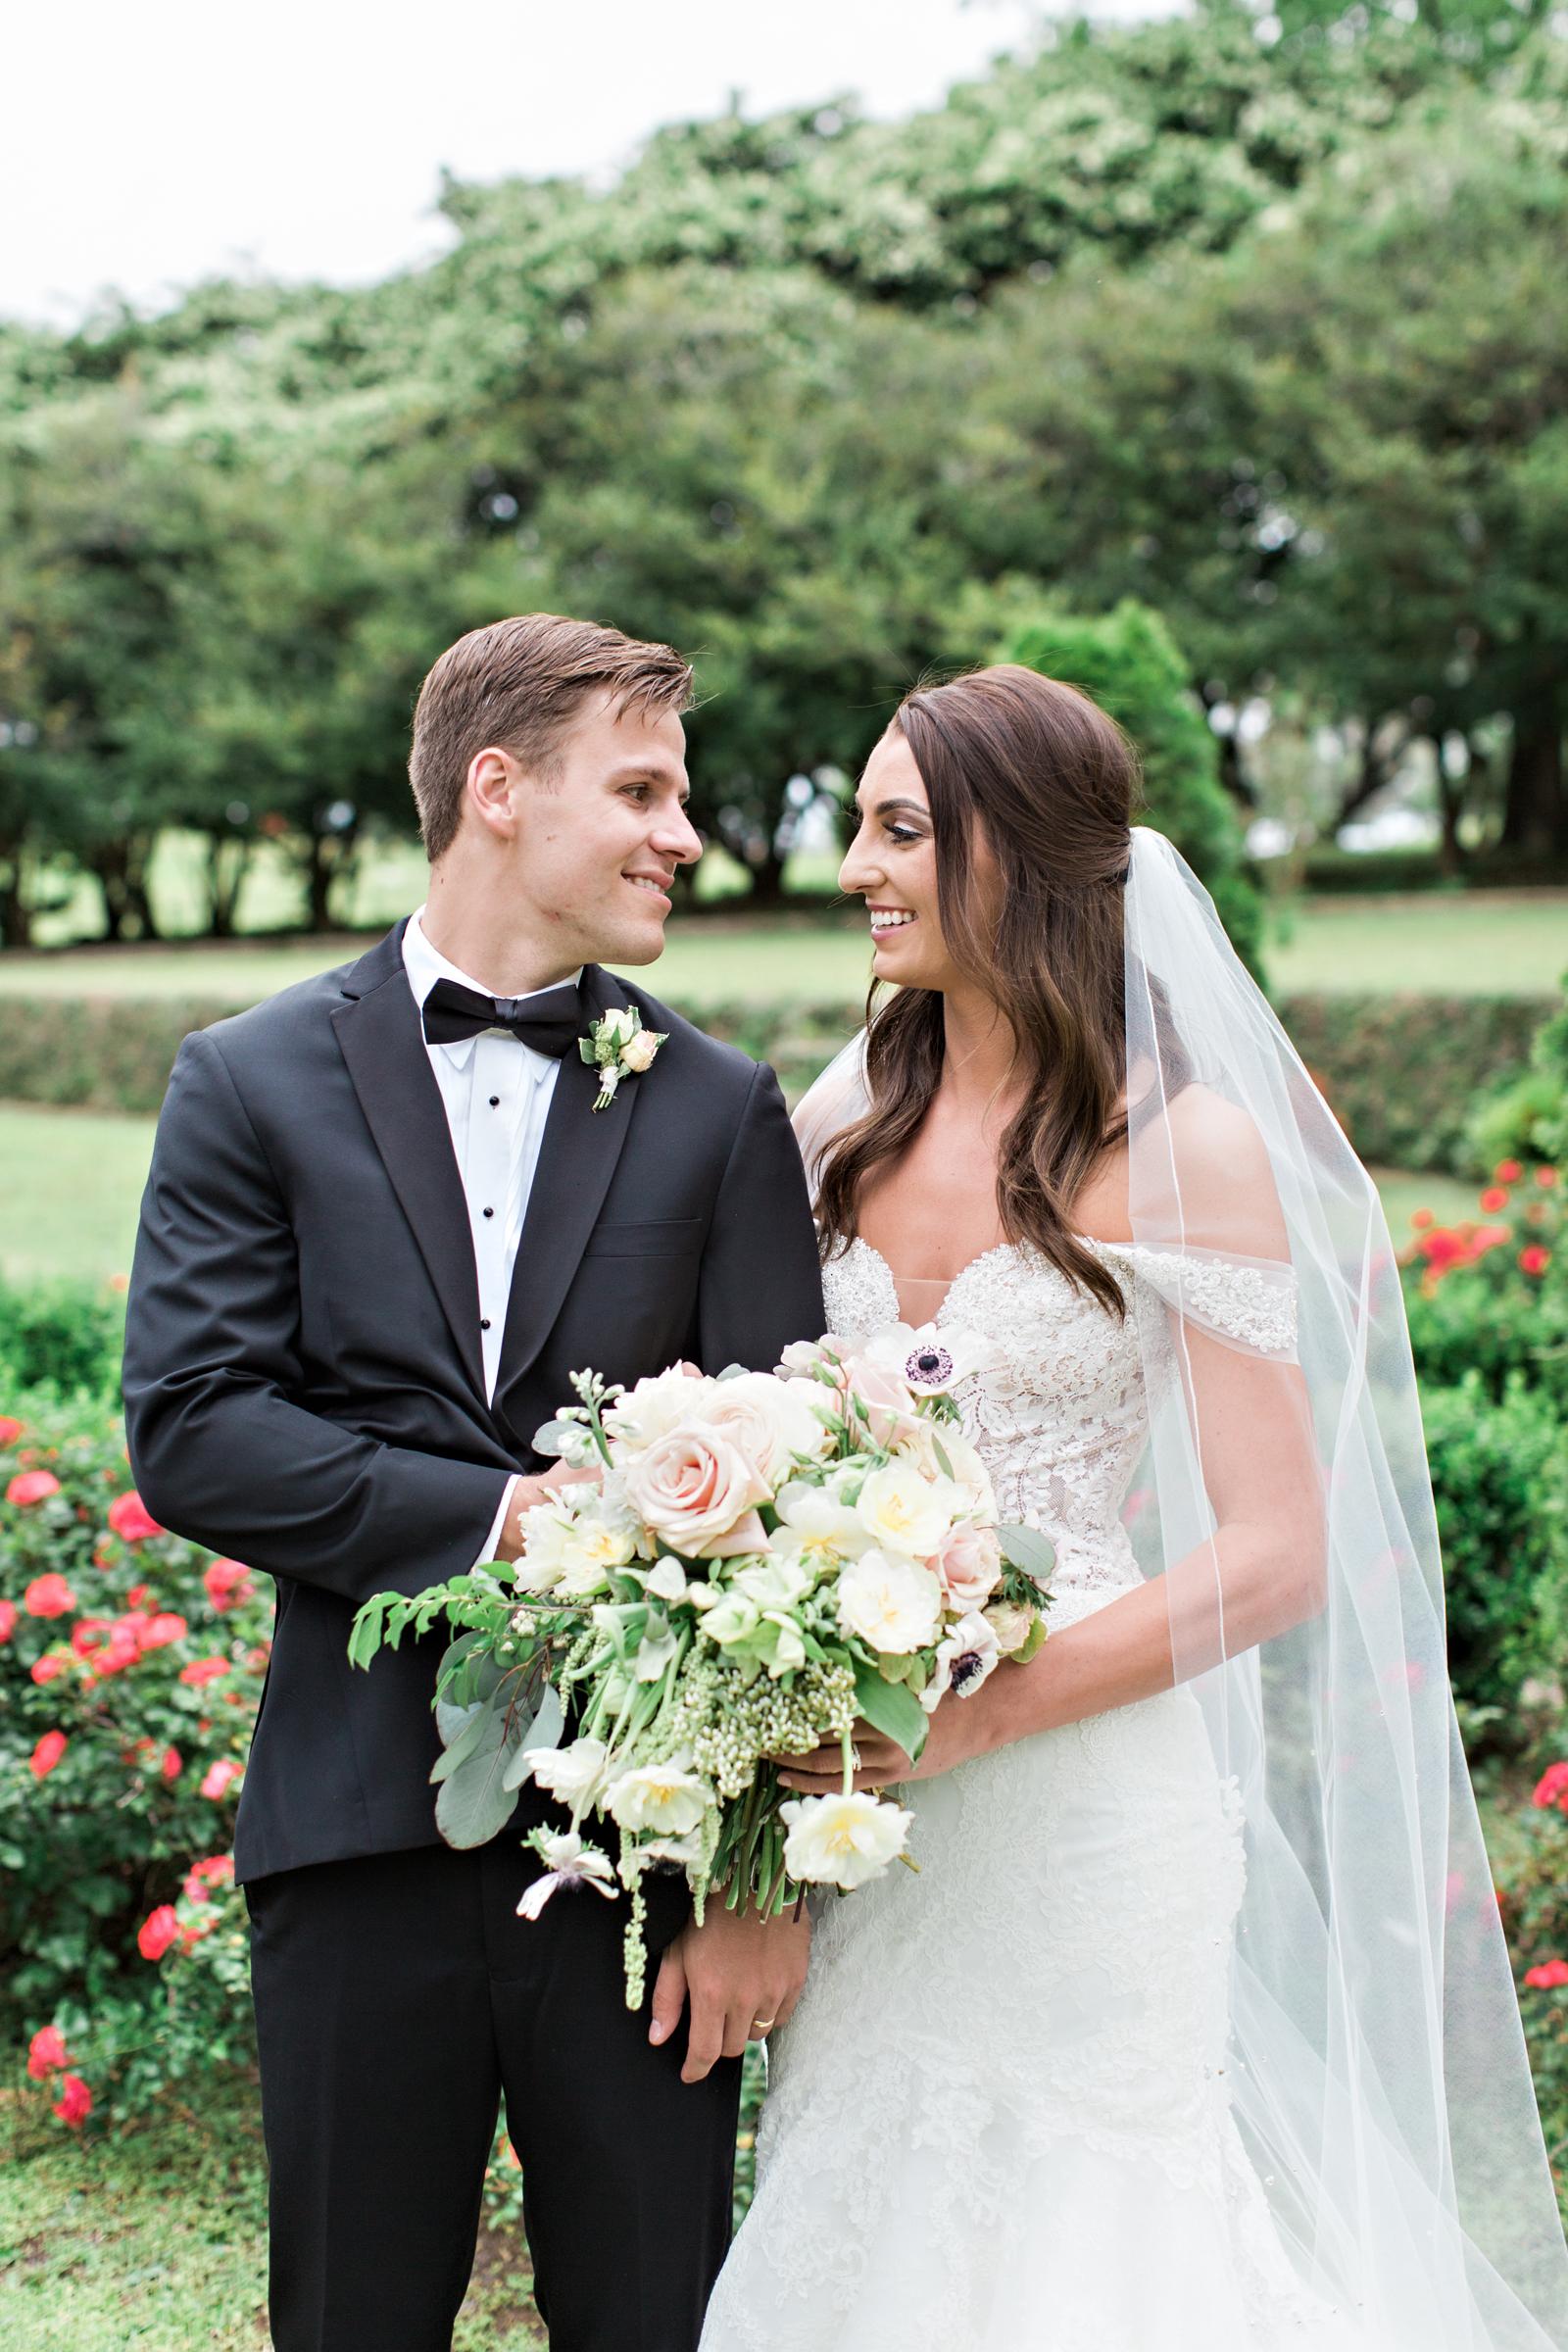 Matty-Drollette-Montgomery-Alabama-Wedding-Photography-150.jpg